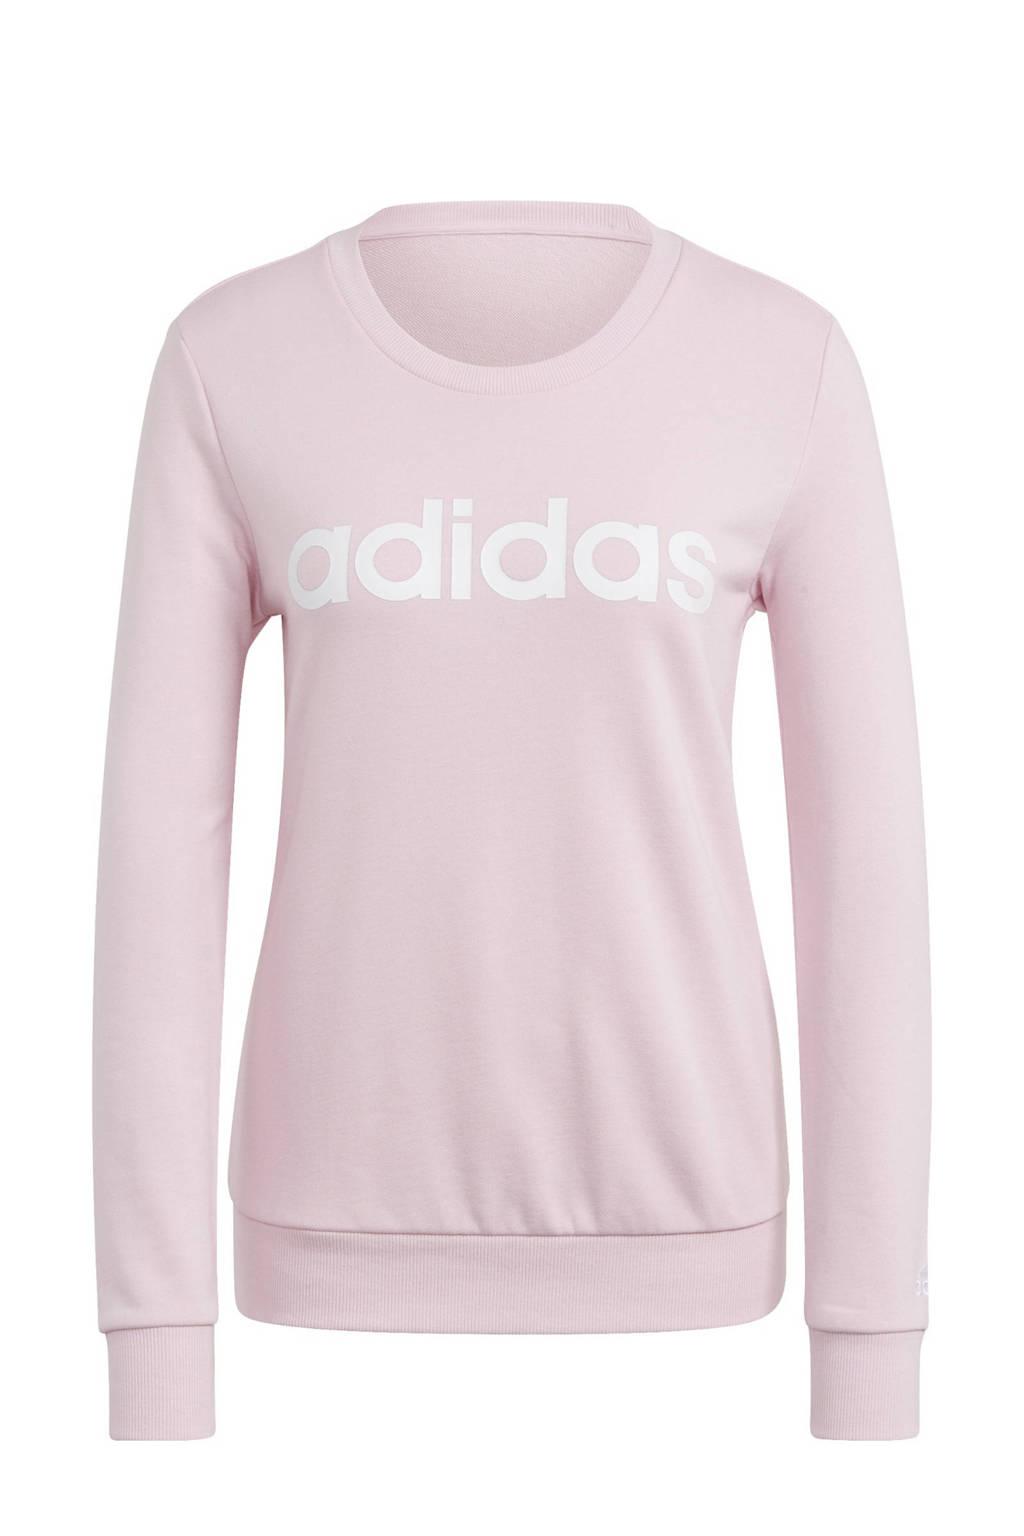 adidas Performance sportsweater lichtroze/wit, Lichtroze/wit